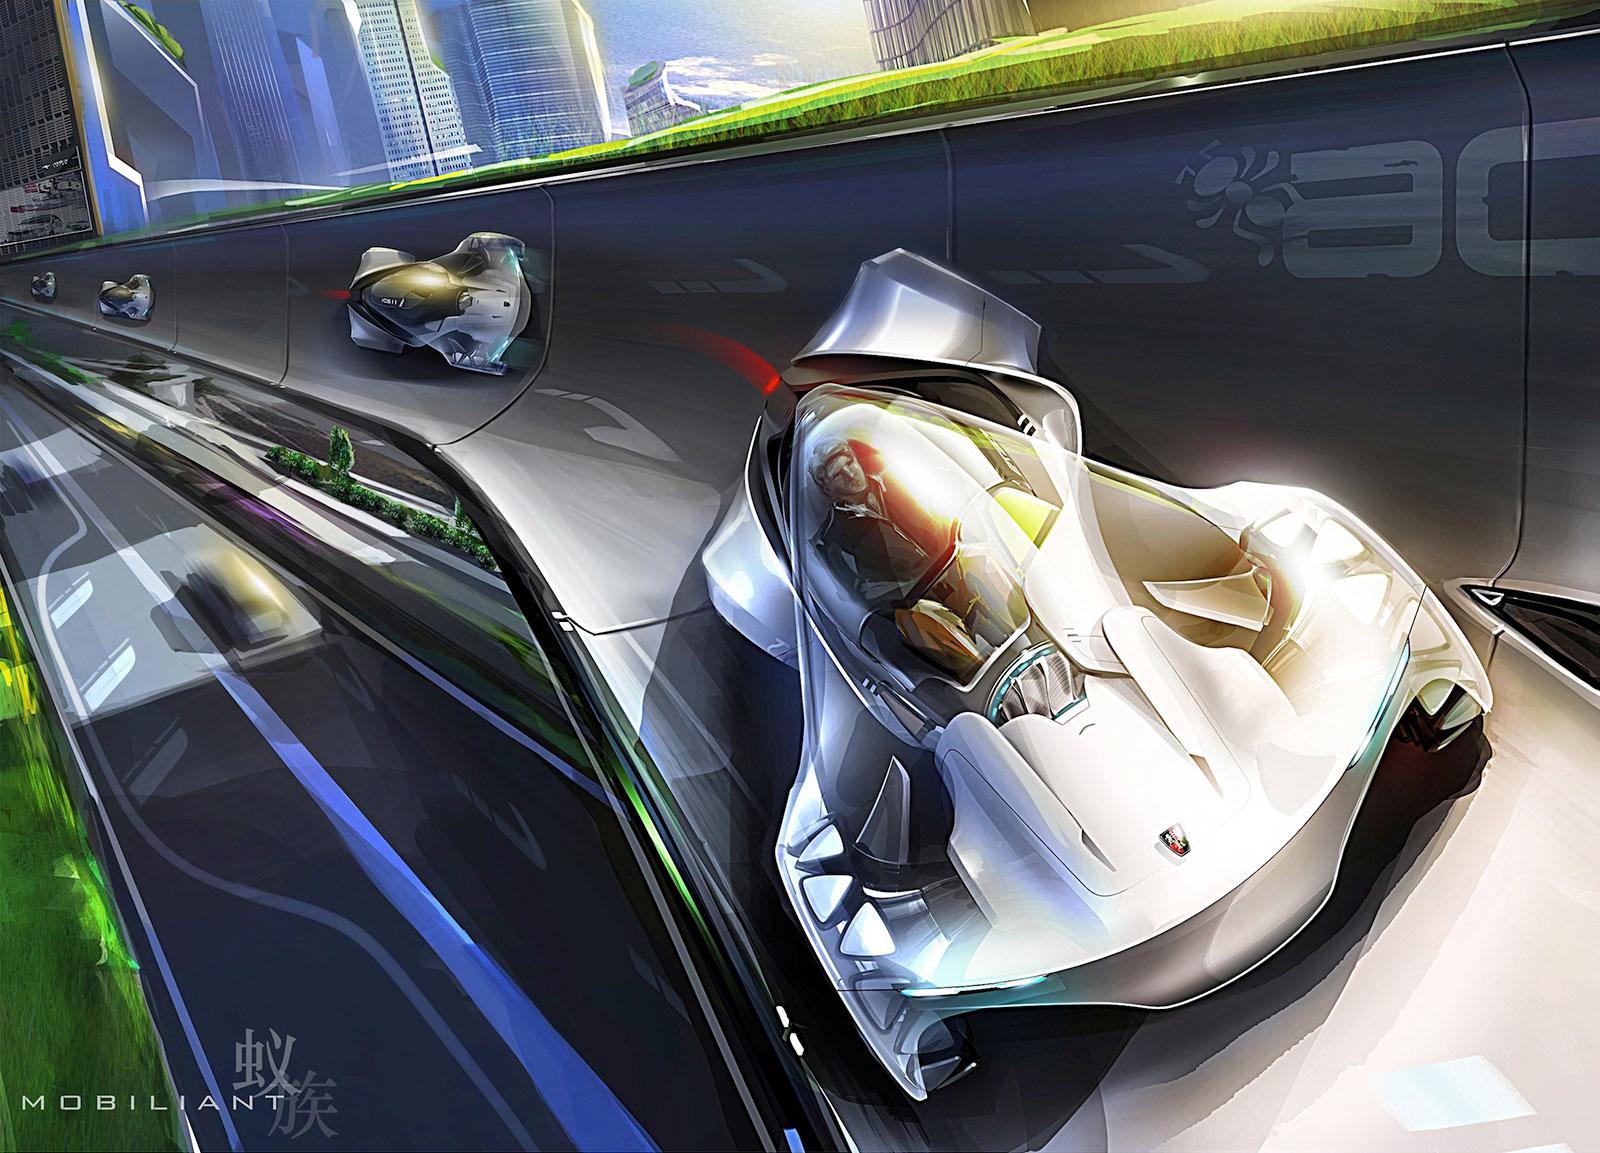 Roewe Mobiliant - Concept Art - Car Body Design